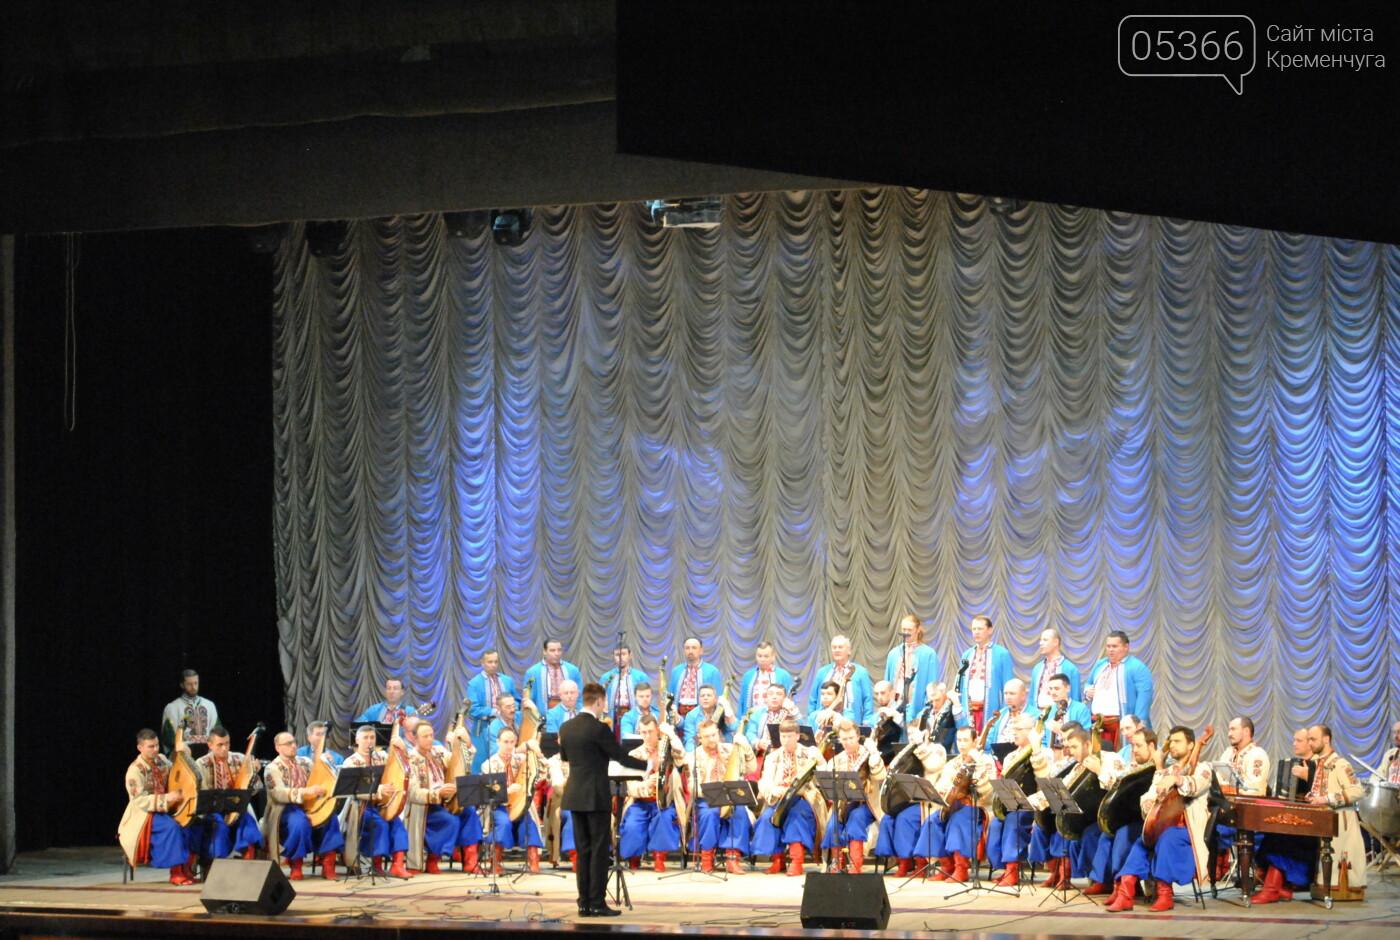 Бандуристи покорили кременчужан своїми виступами та музикою. Фото, фото-4